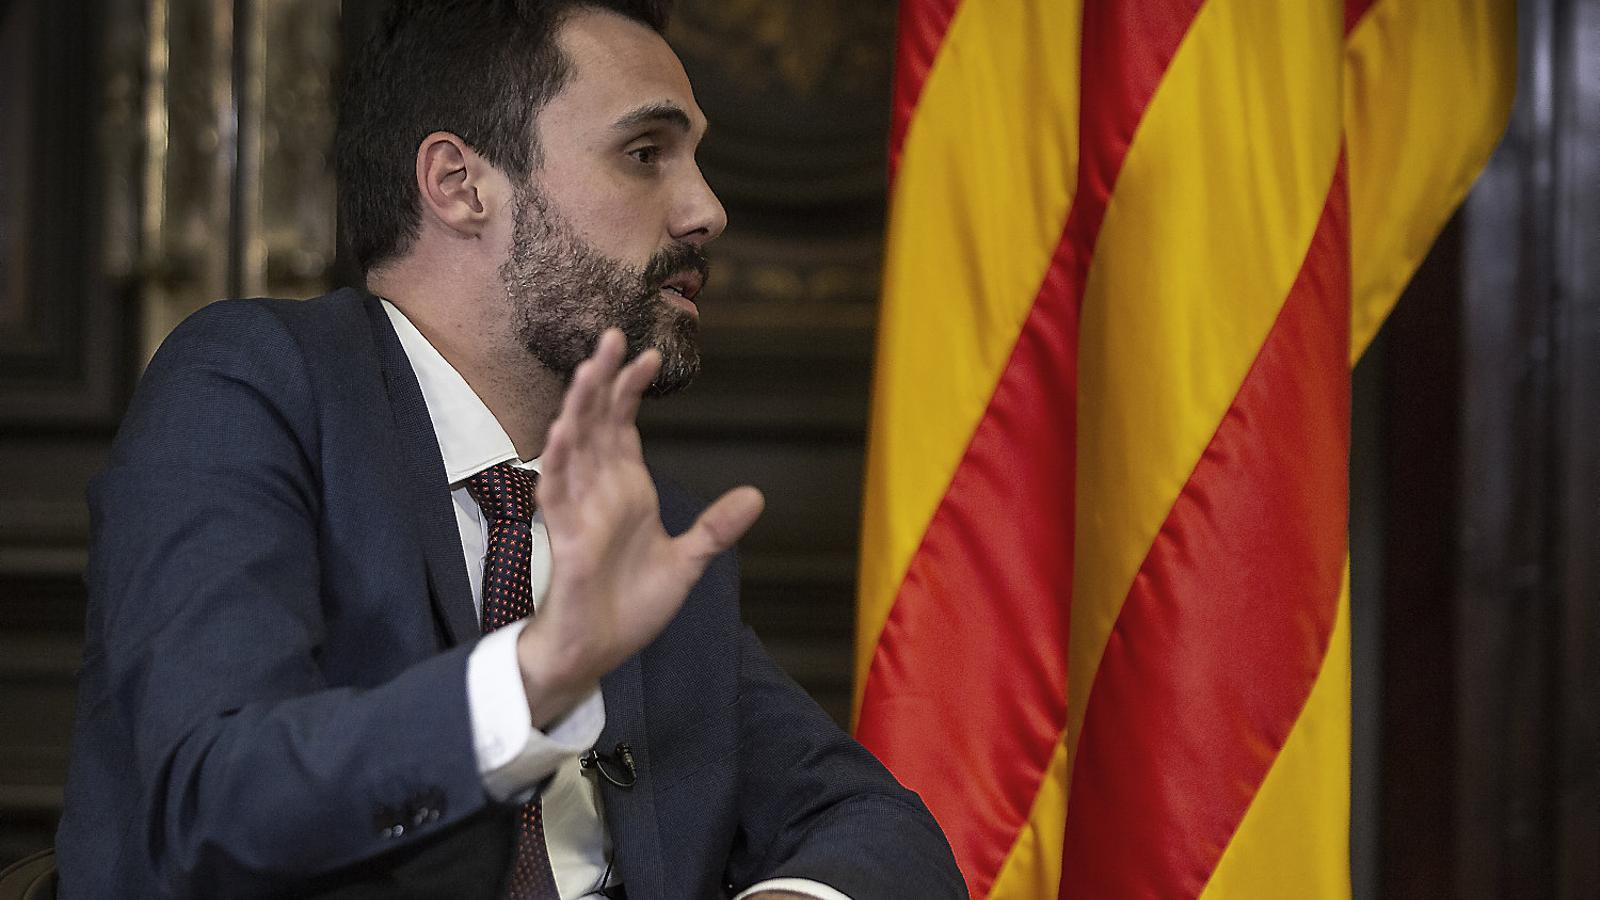 El Parlament activa la reforma per investir Puigdemont